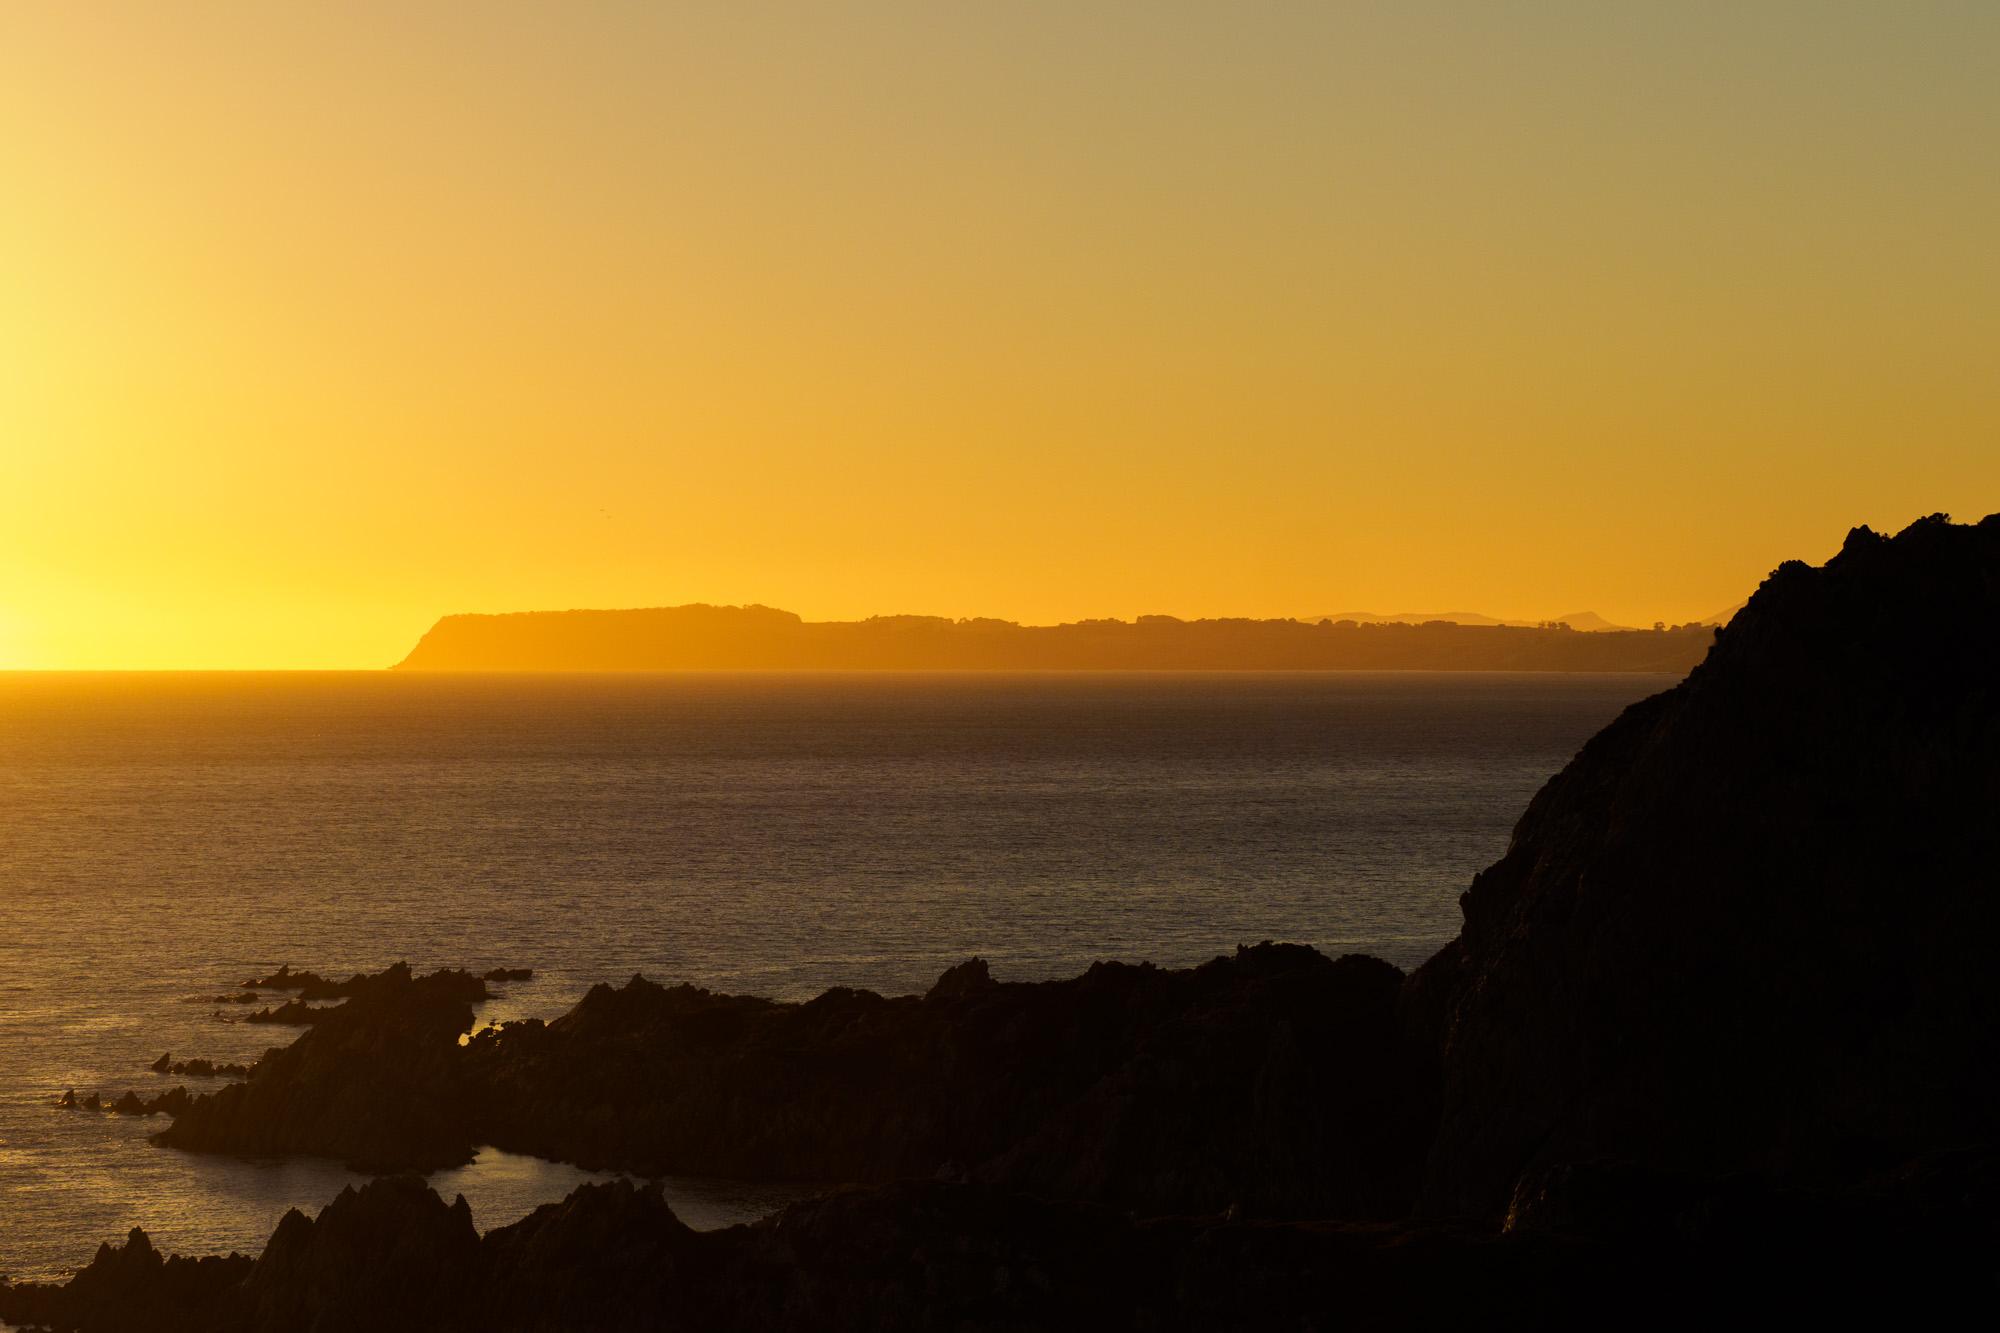 Nordküste - Sonnenaufgang beim Rocky Cape Lighthouse